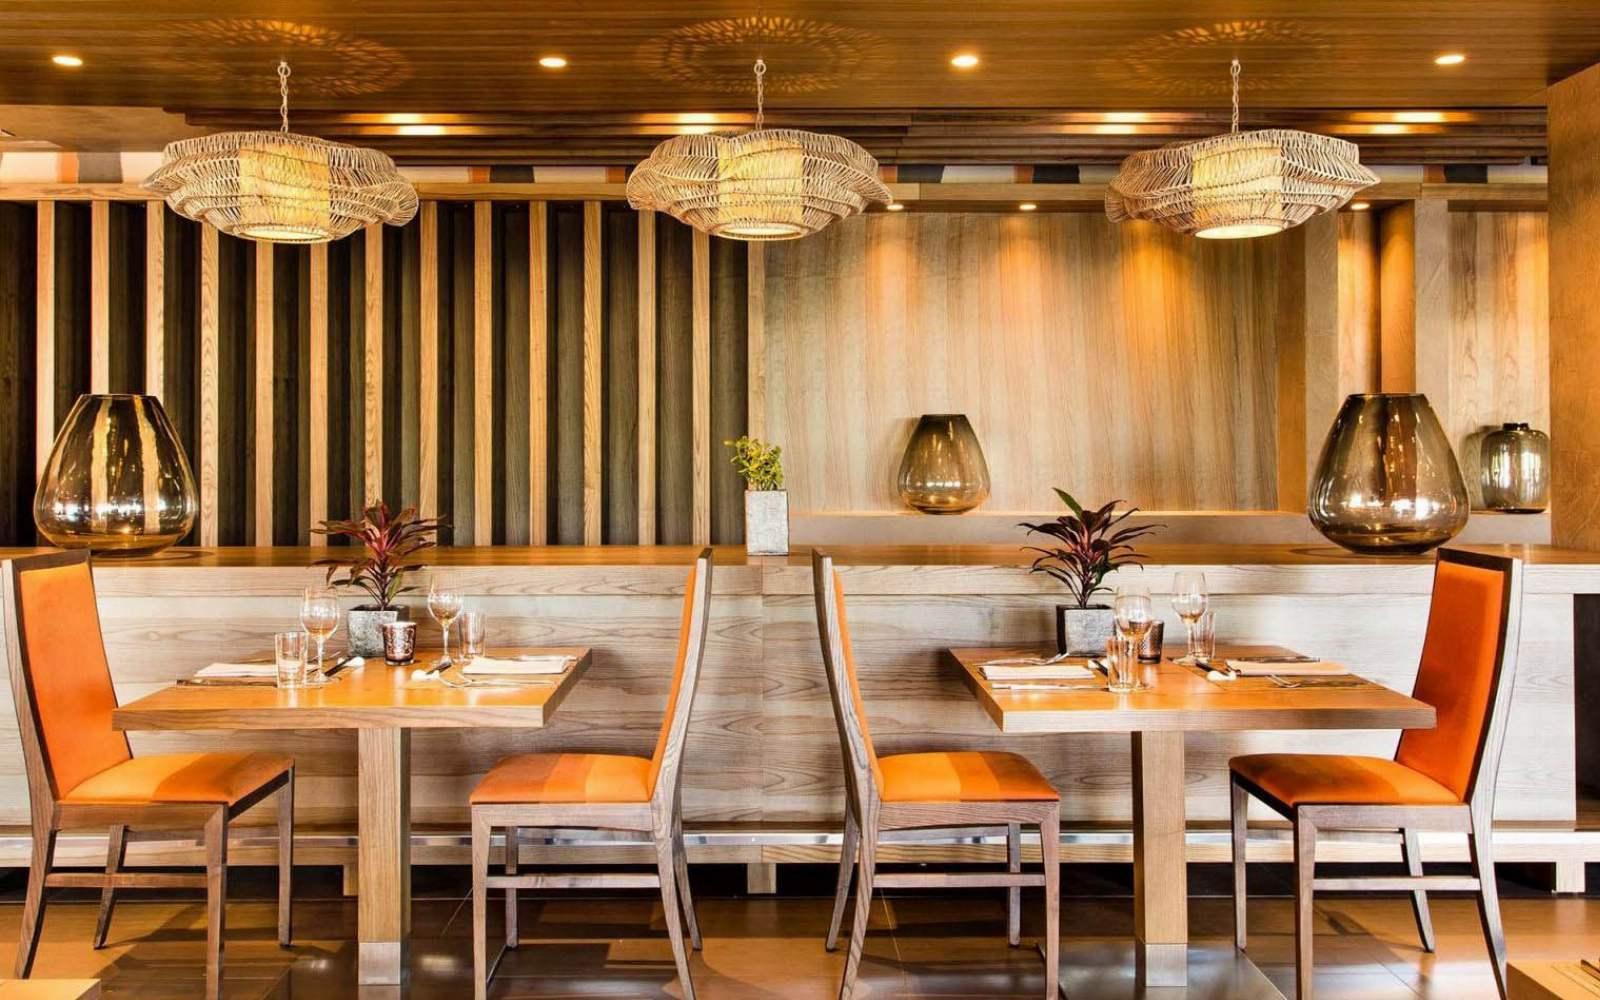 Ikos Olivia - Anaya restaurant